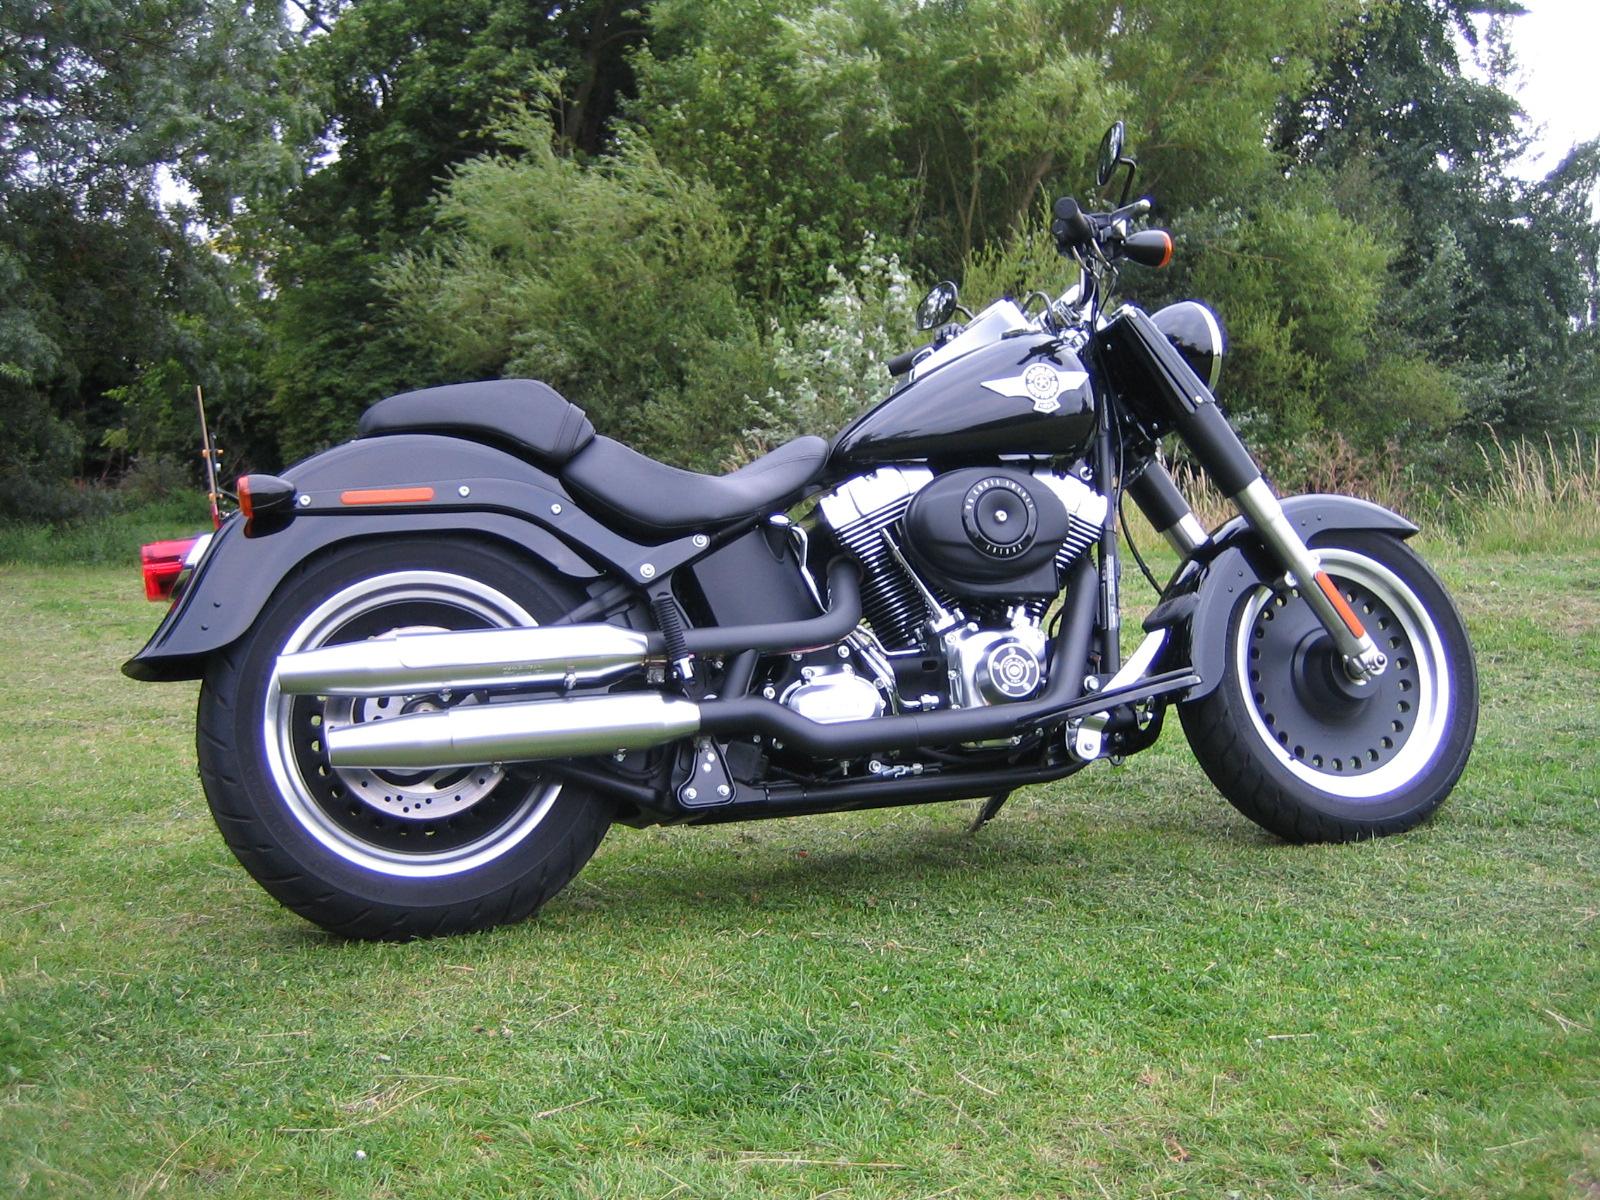 Fat Boy A Big Bike For Blokes Who Love Harleys Wheel World Harley Davidson Fatboy With Fairing Once